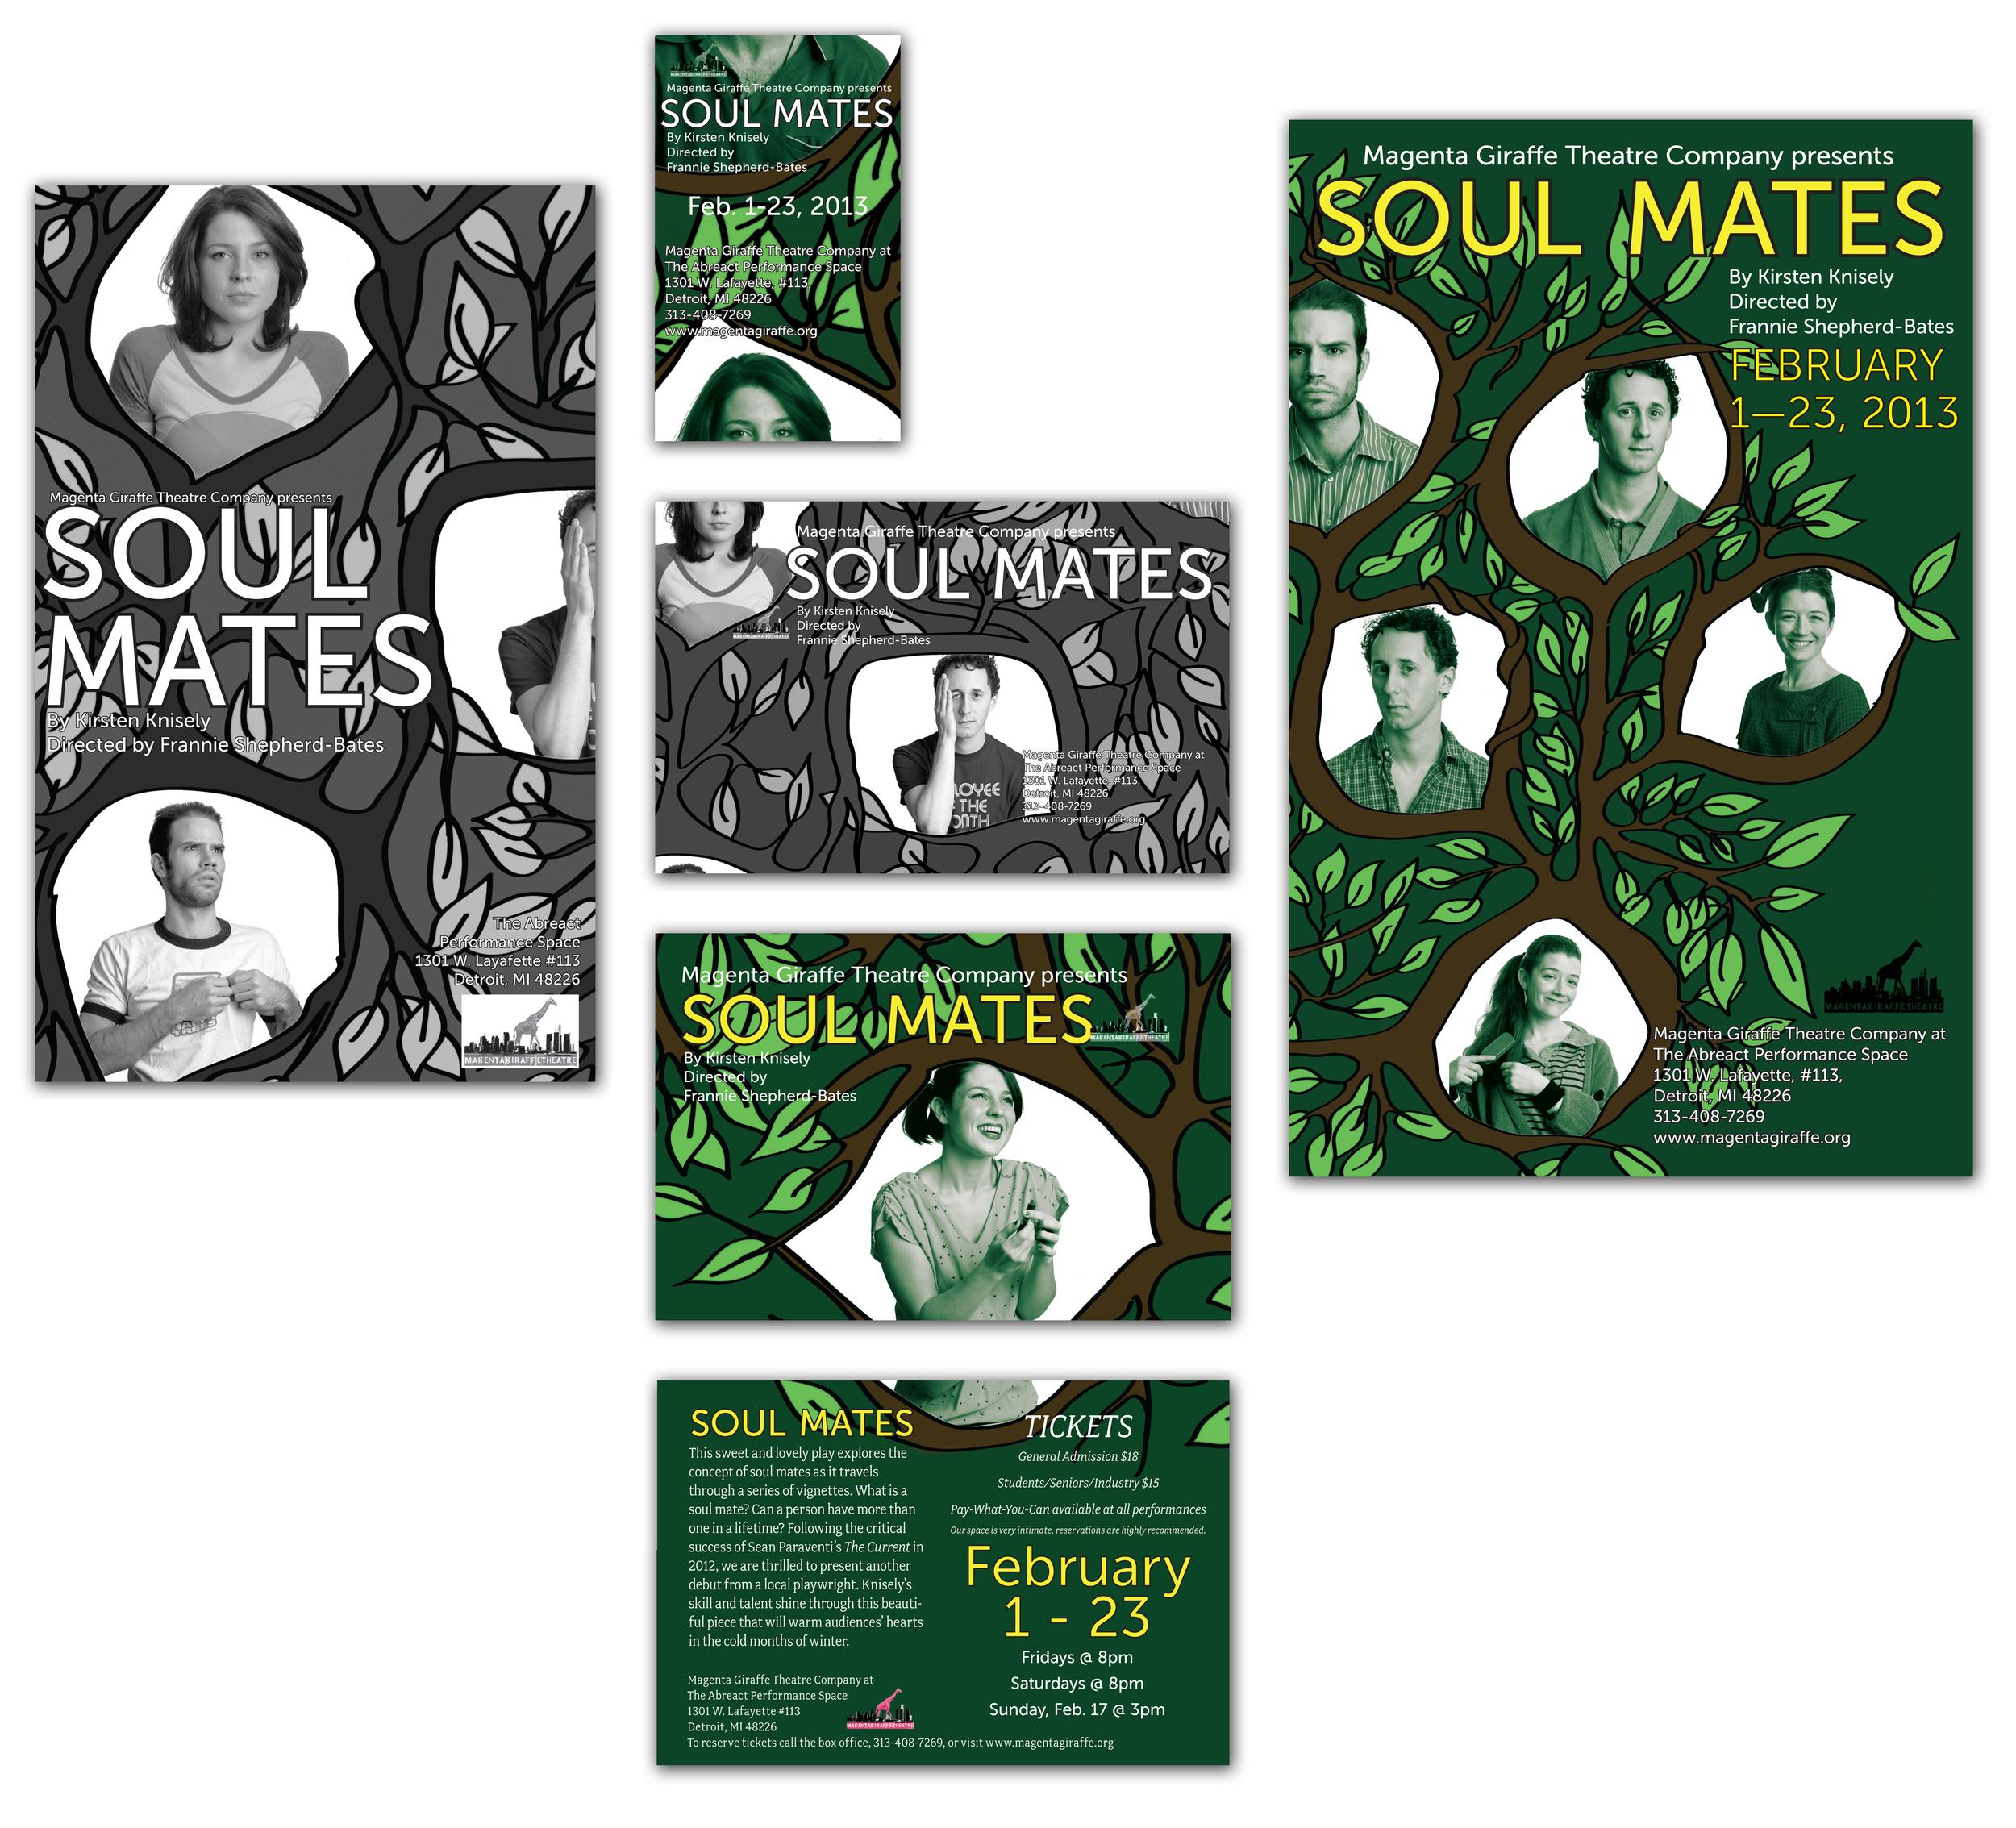 Soul Mates Marketing